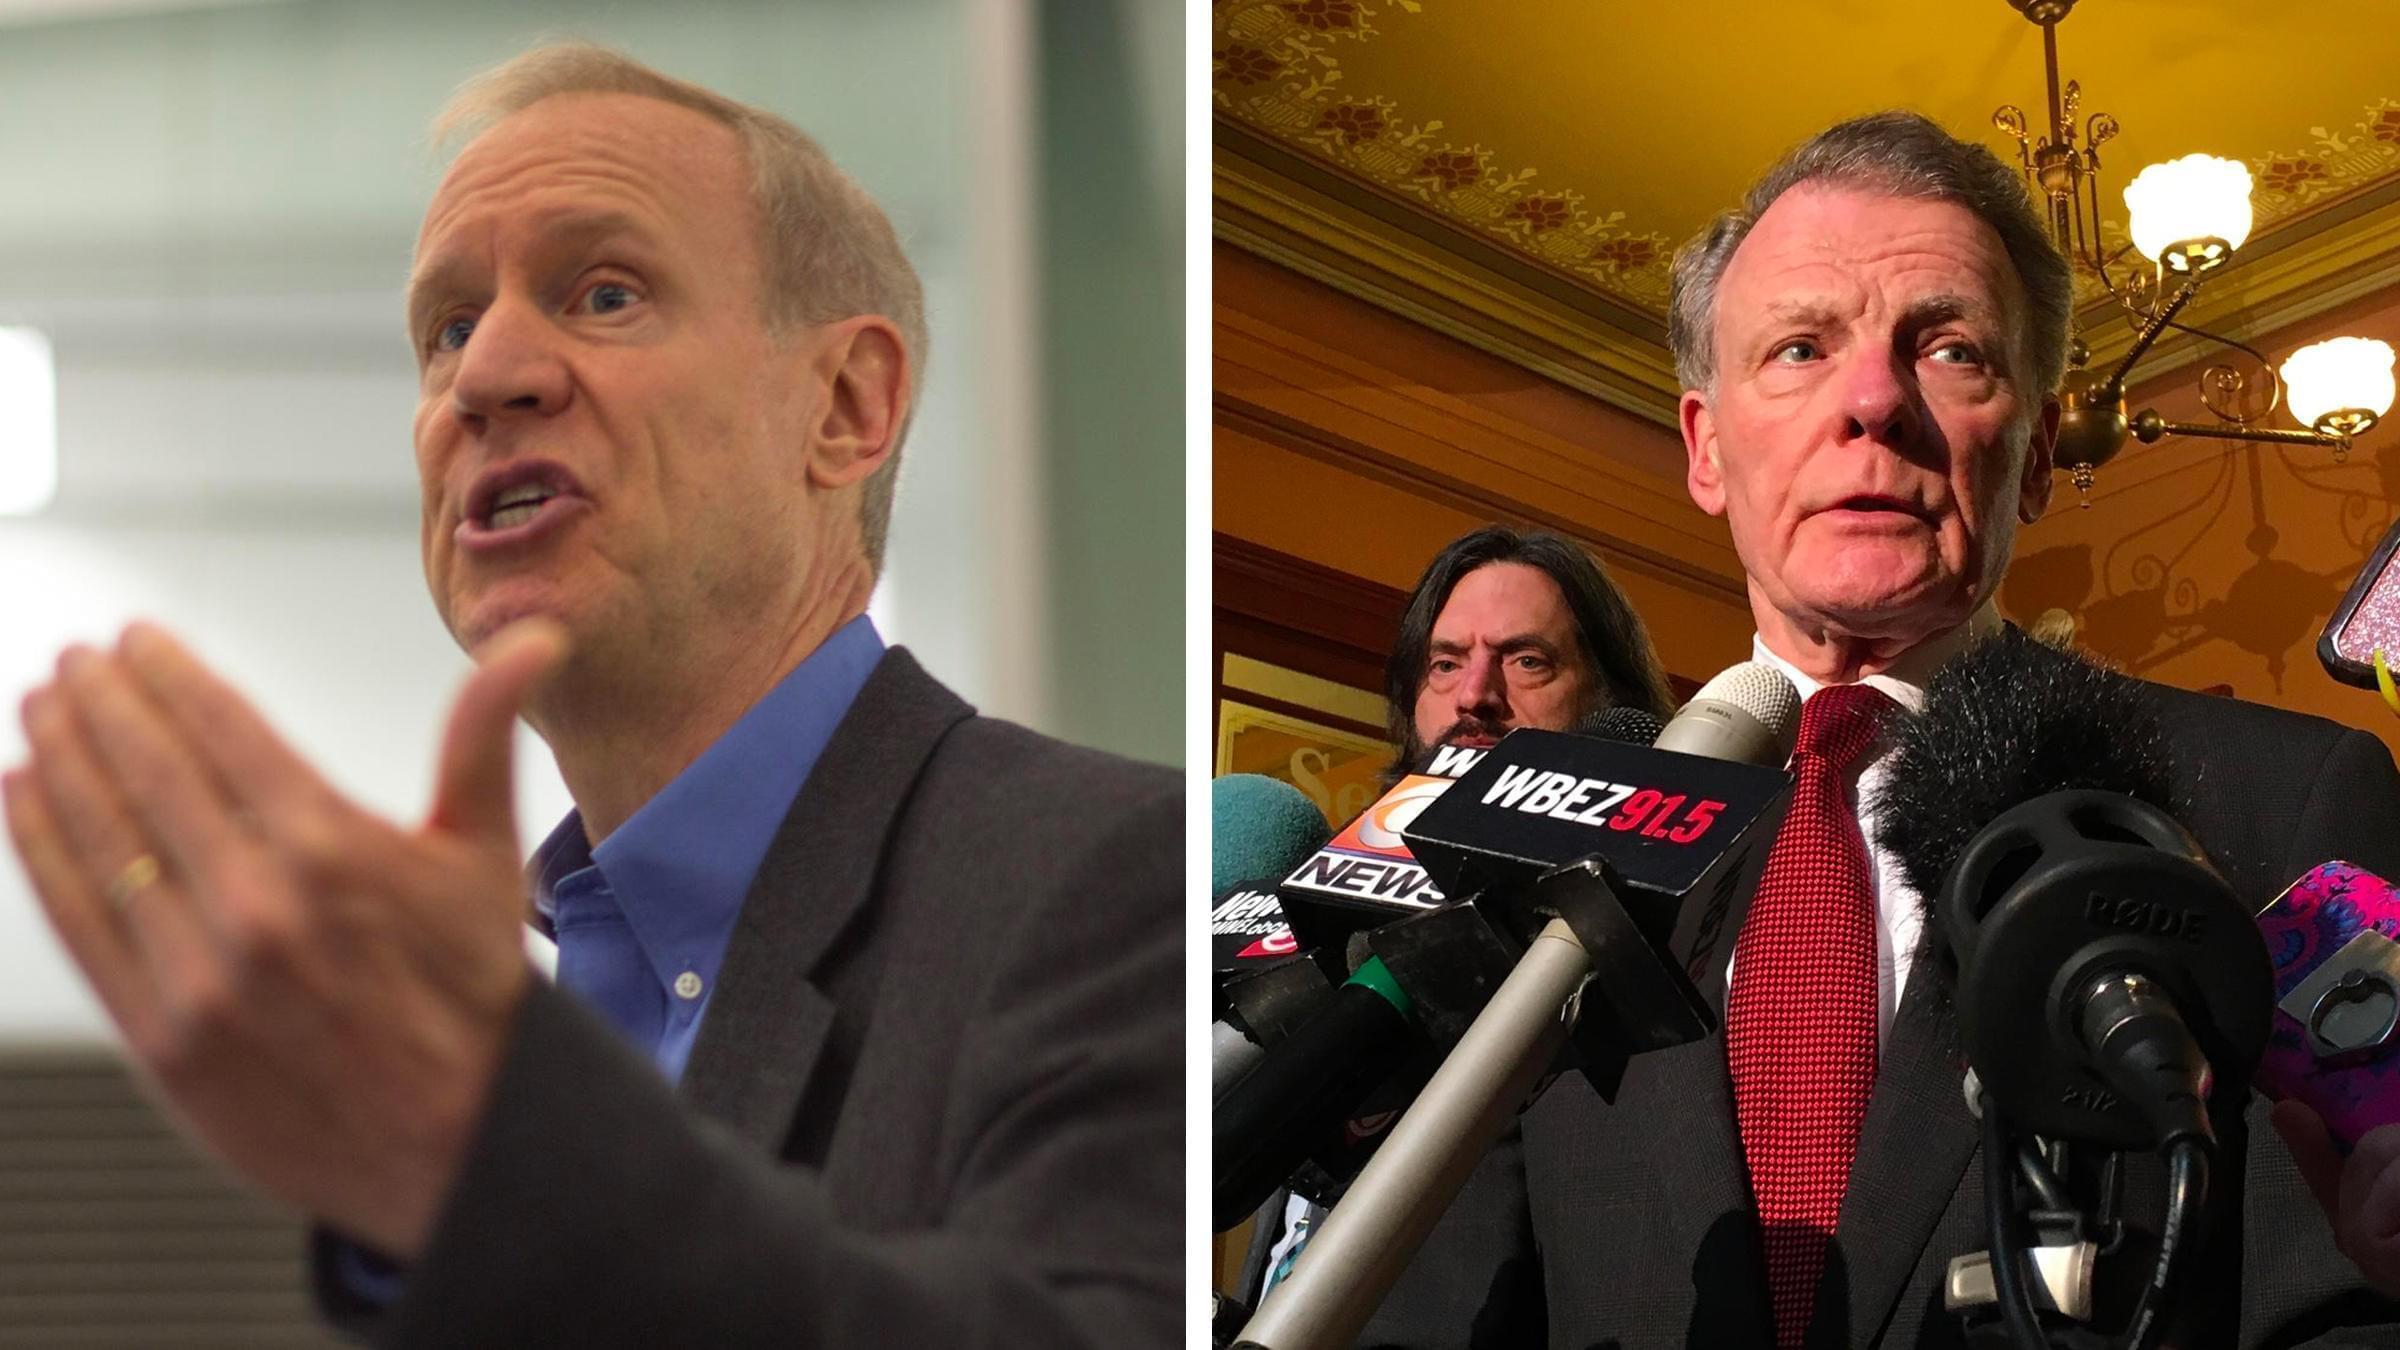 Governor Bruce Rauner and House speaker Michael Madigan